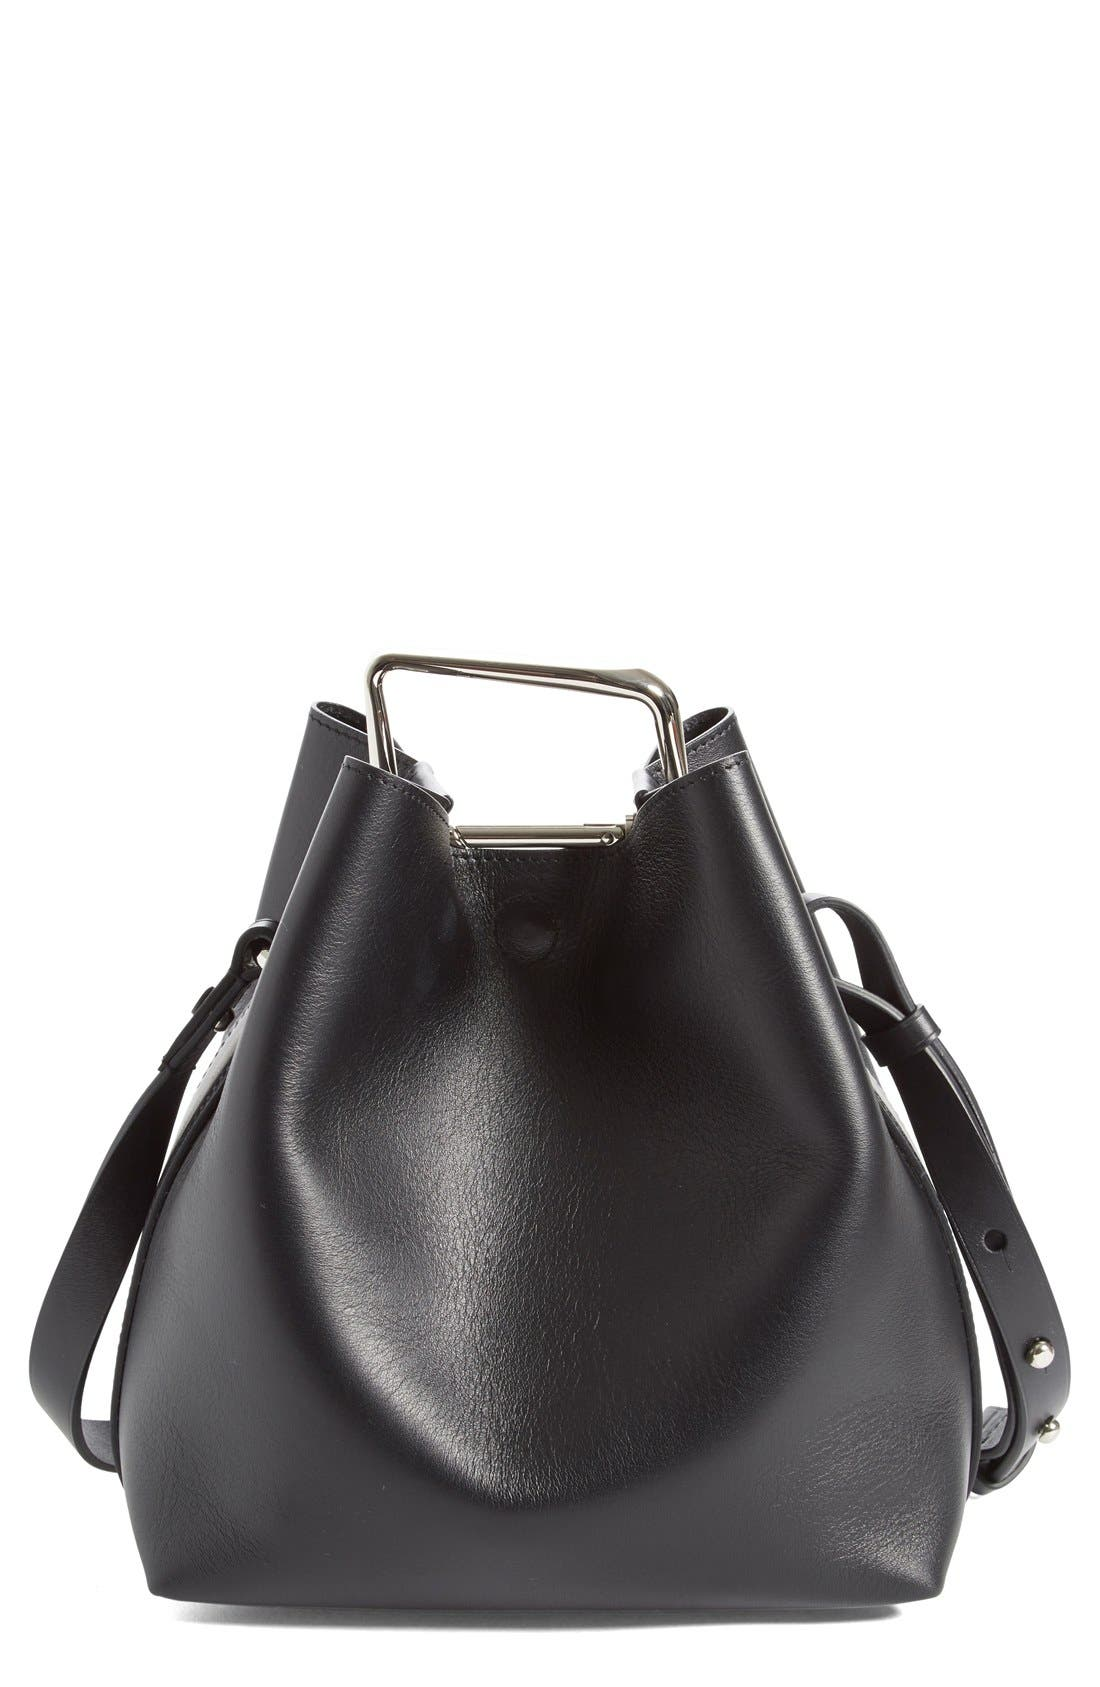 Main Image - 3.1 Phillip Lim 'Mini Quill' Leather Bucket Bag